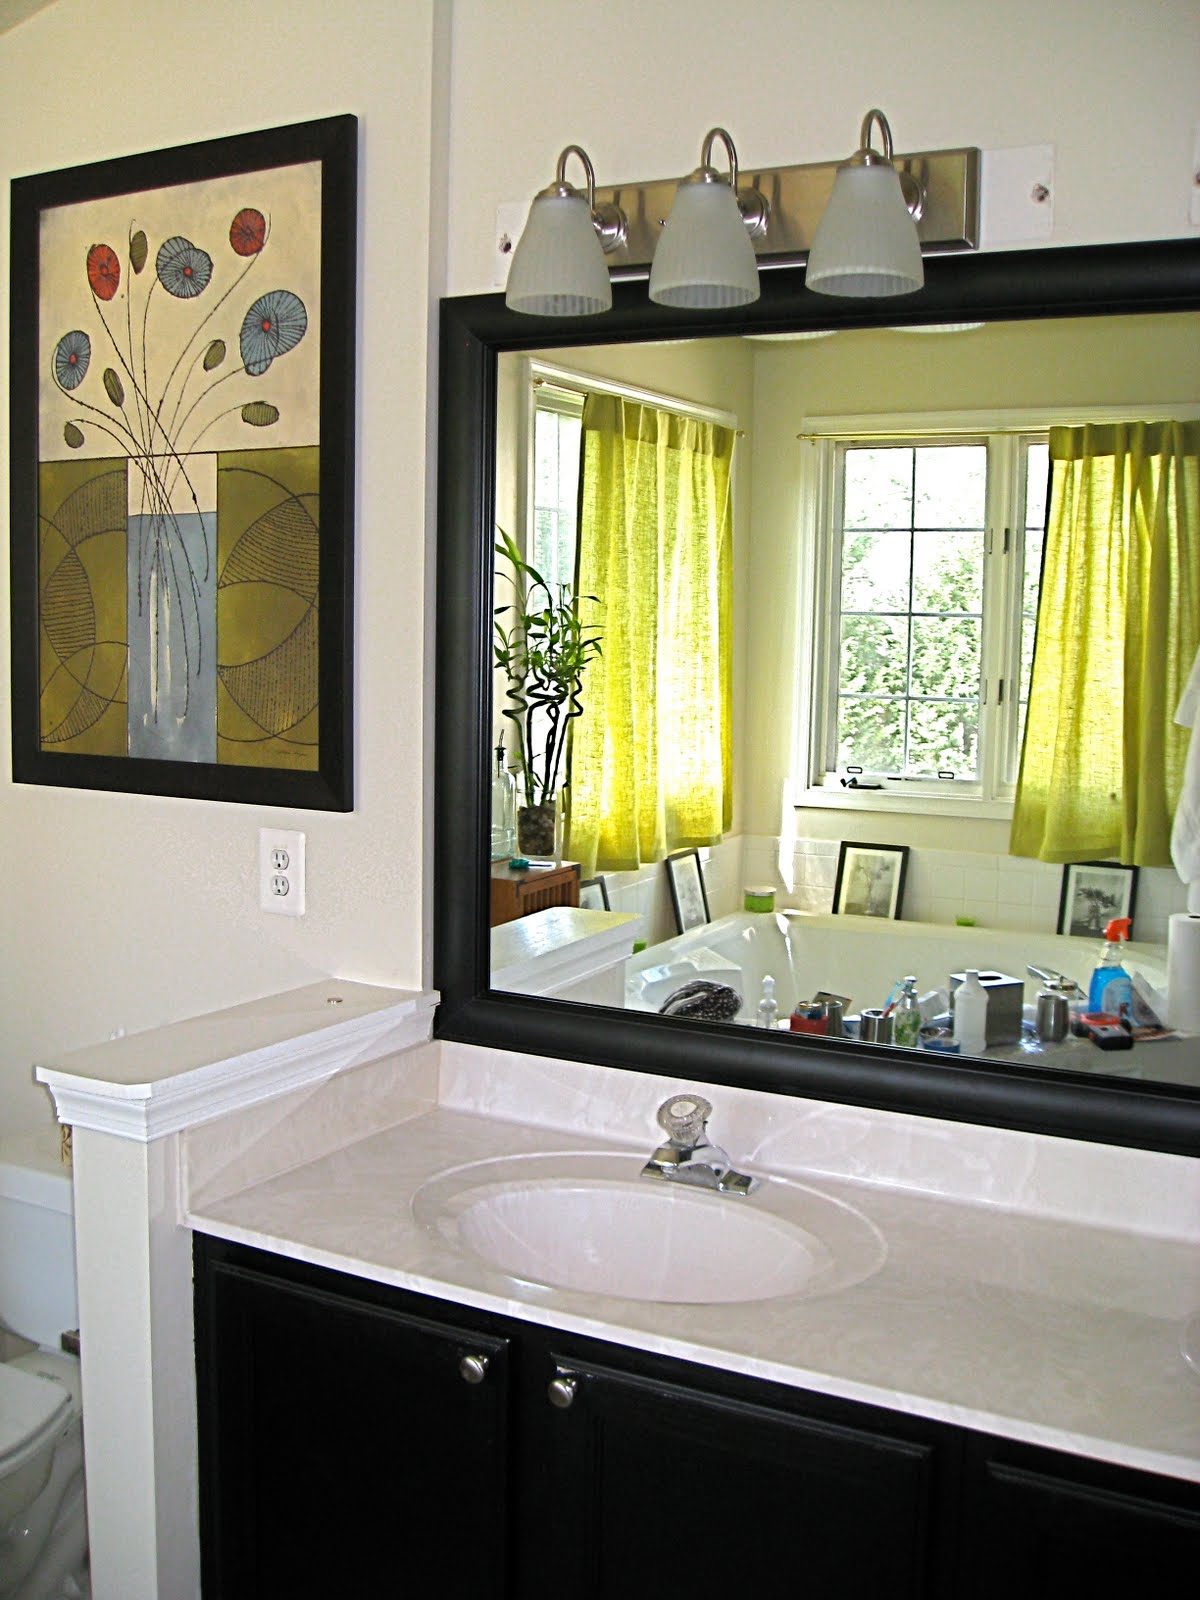 Winners Of The Beautiful Bathrooms Challenge The Csi